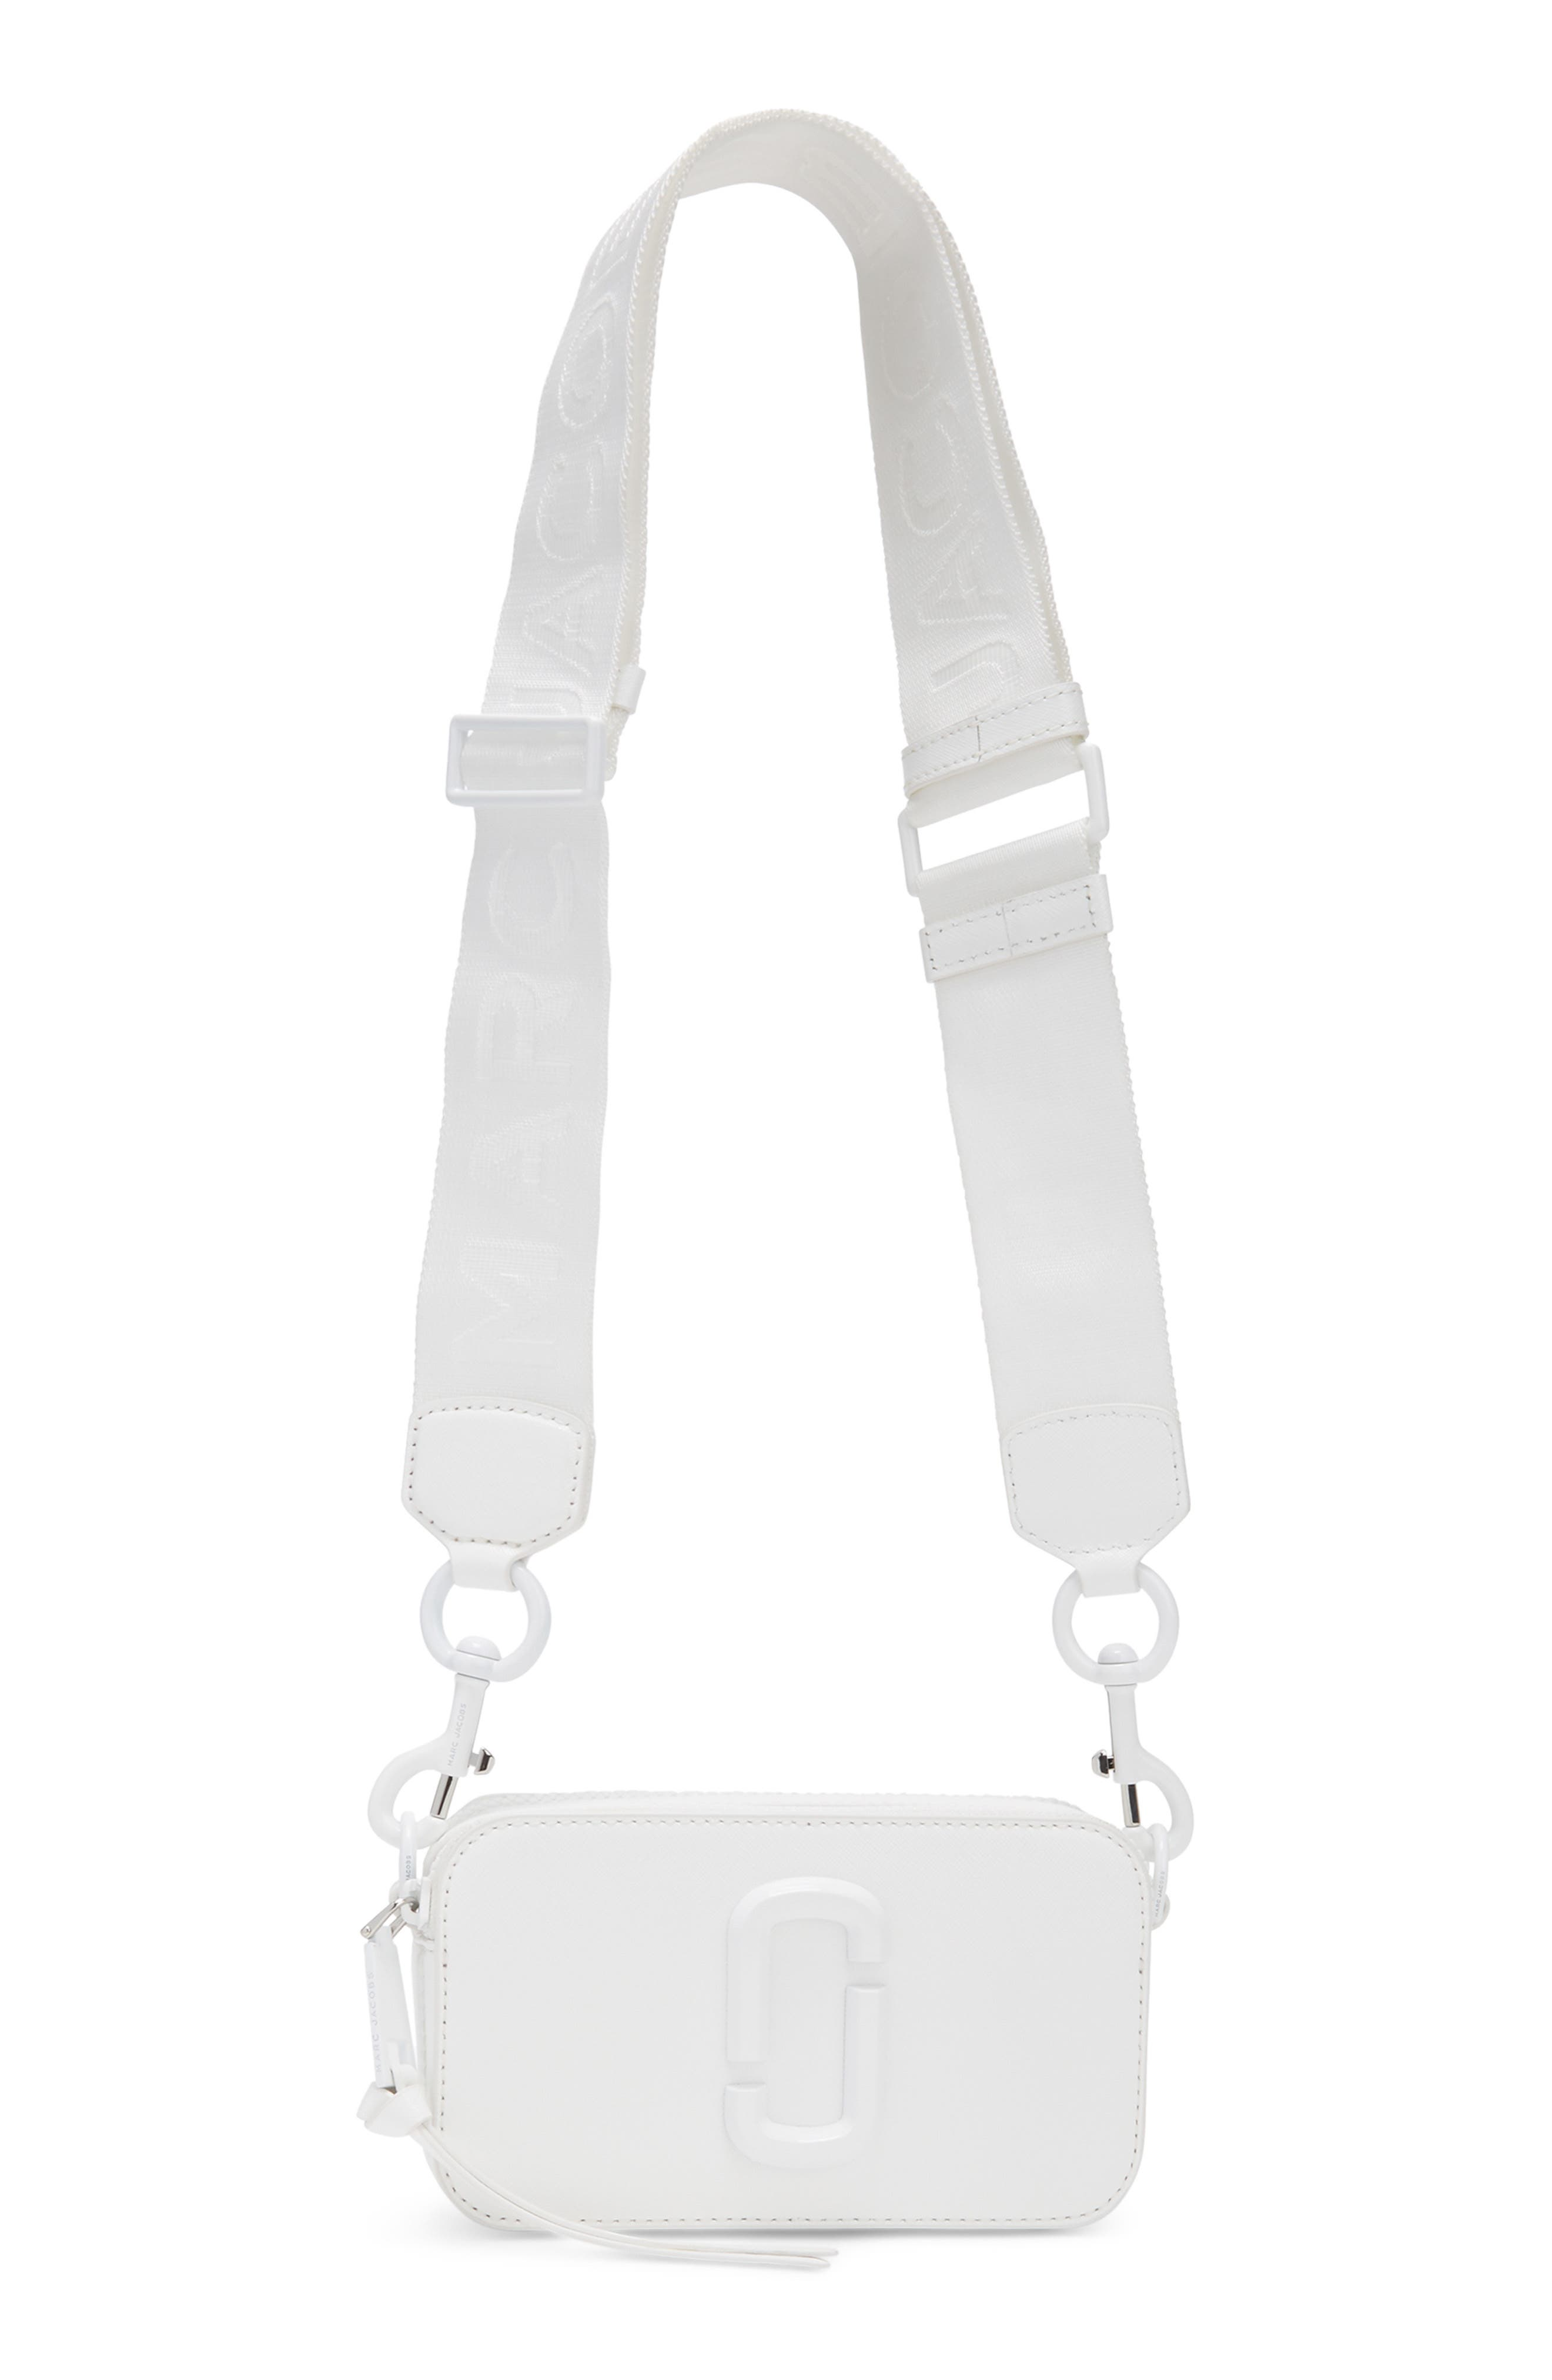 MARC JACOBS, Snapshot Leather Crossbody Bag, Alternate thumbnail 4, color, MOON WHITE